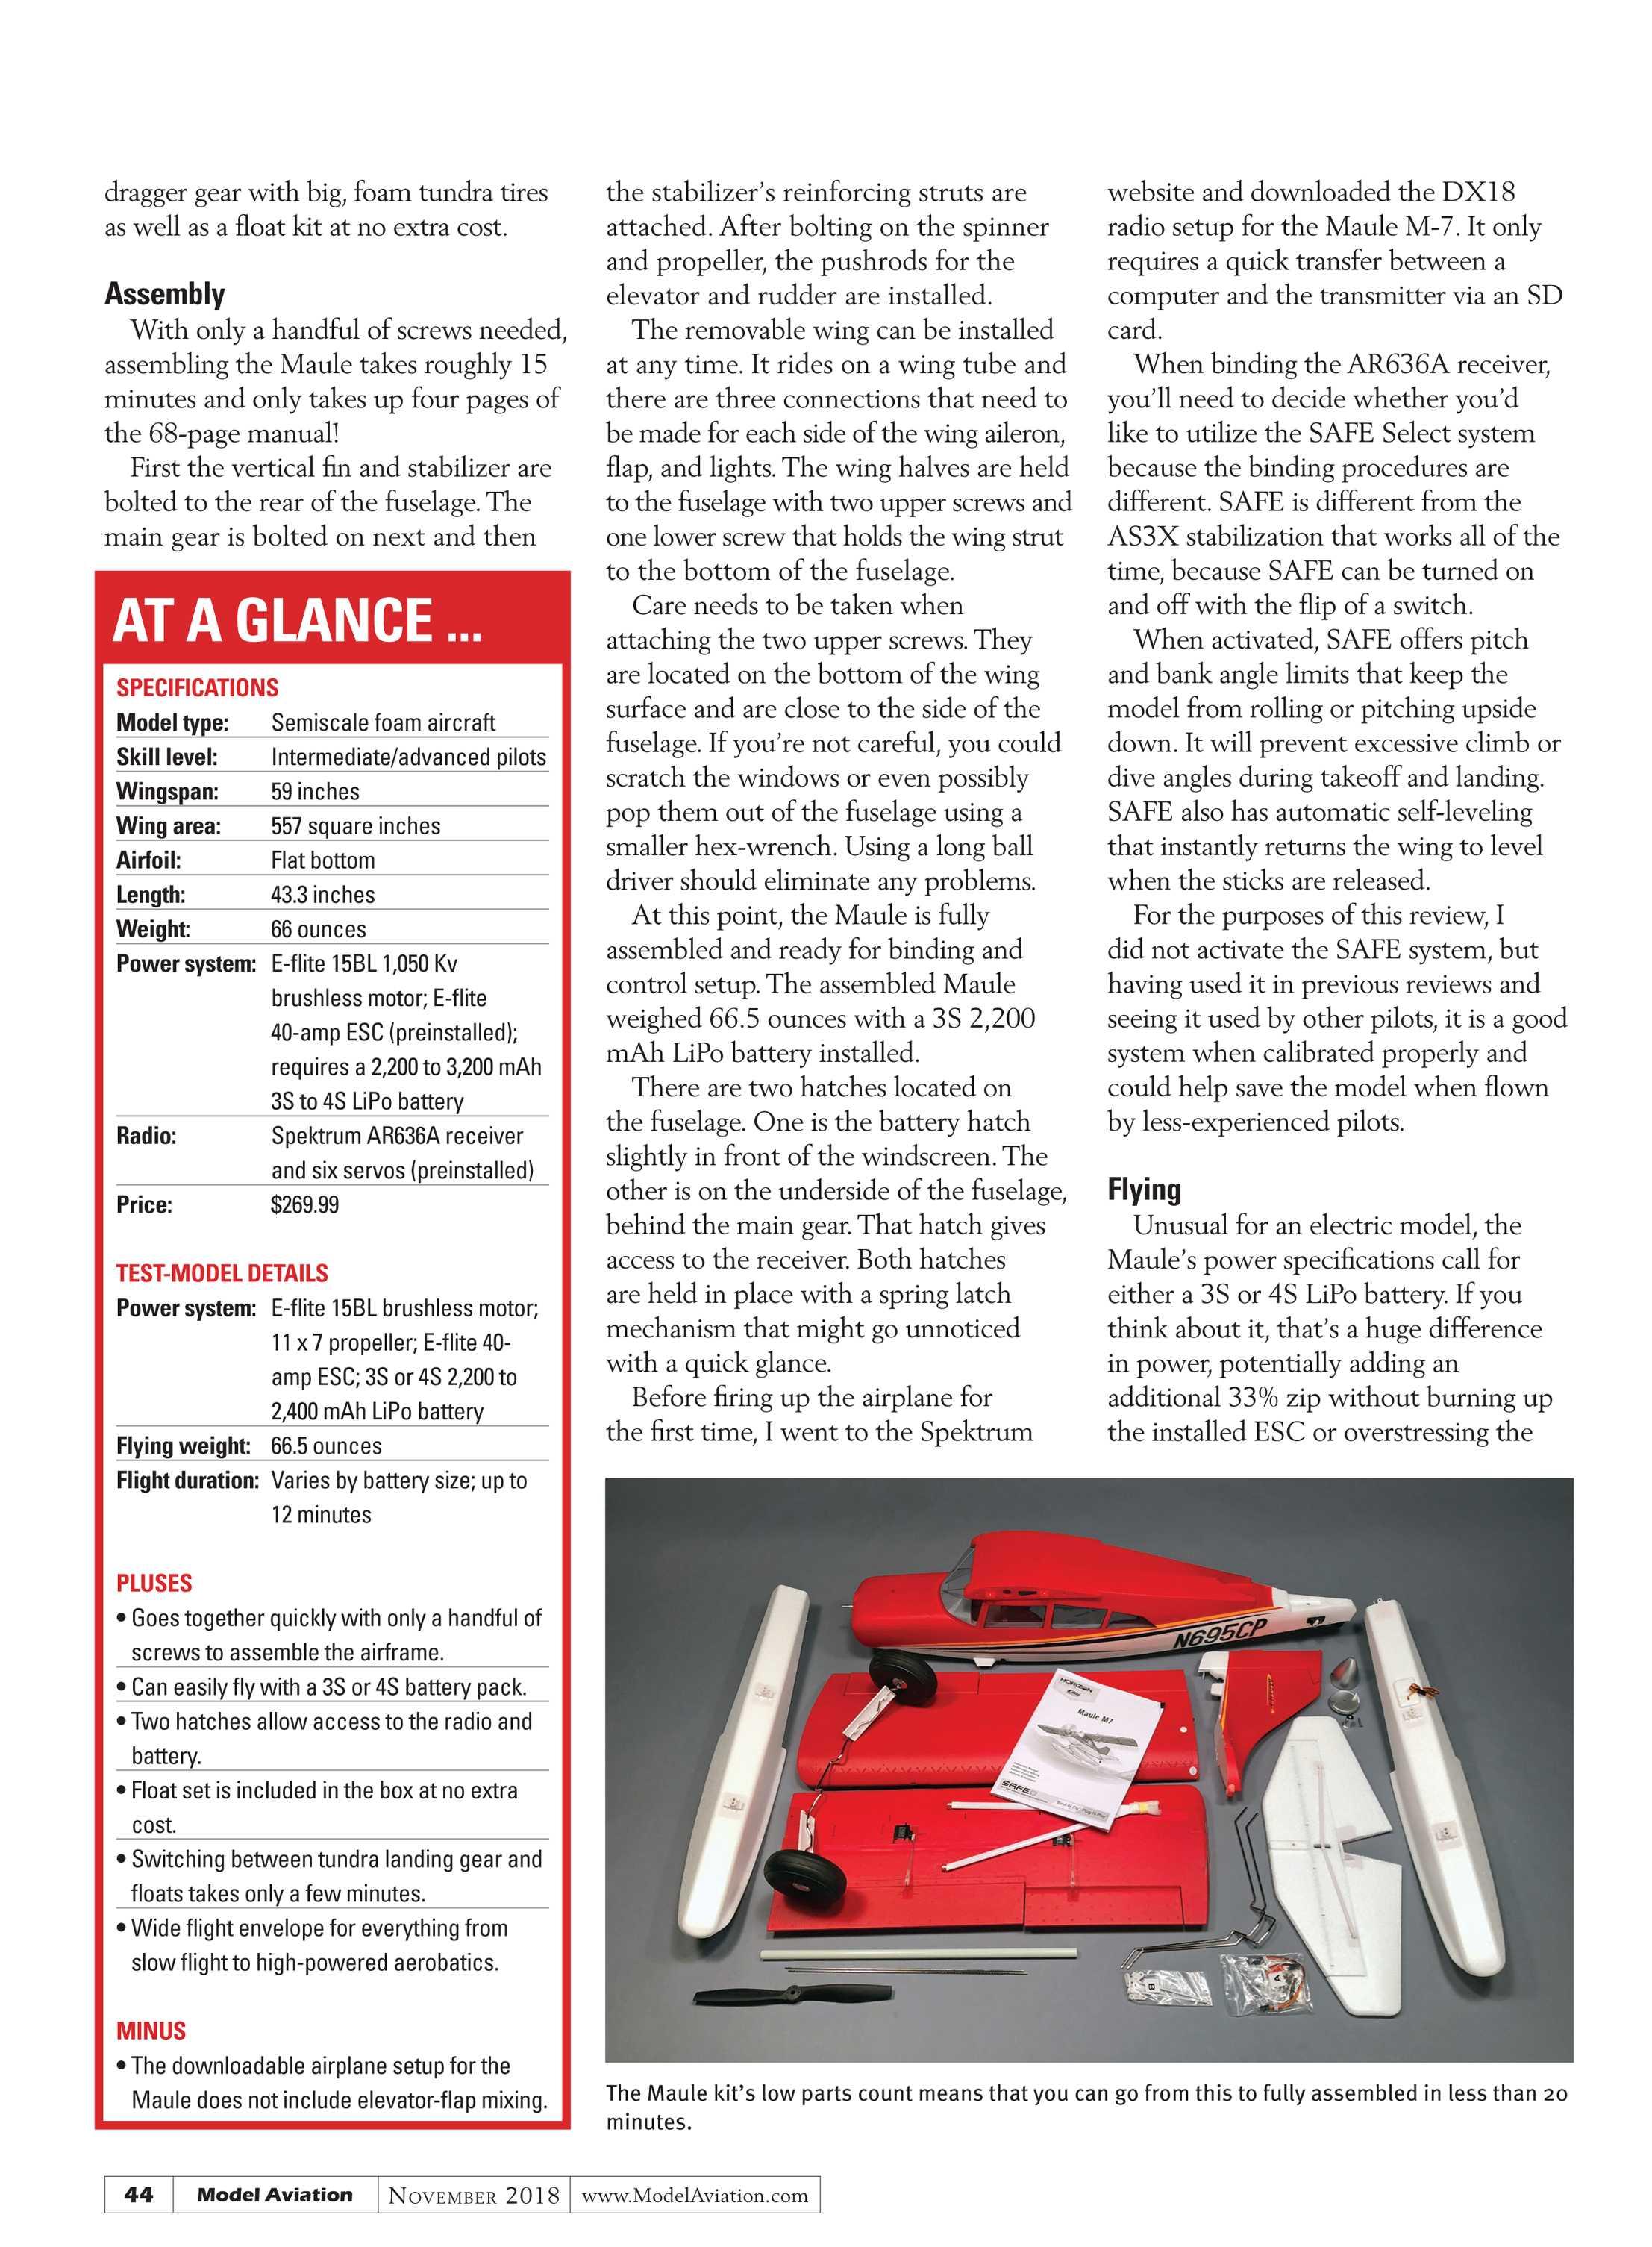 Model Aviation - November 2018 - page 43